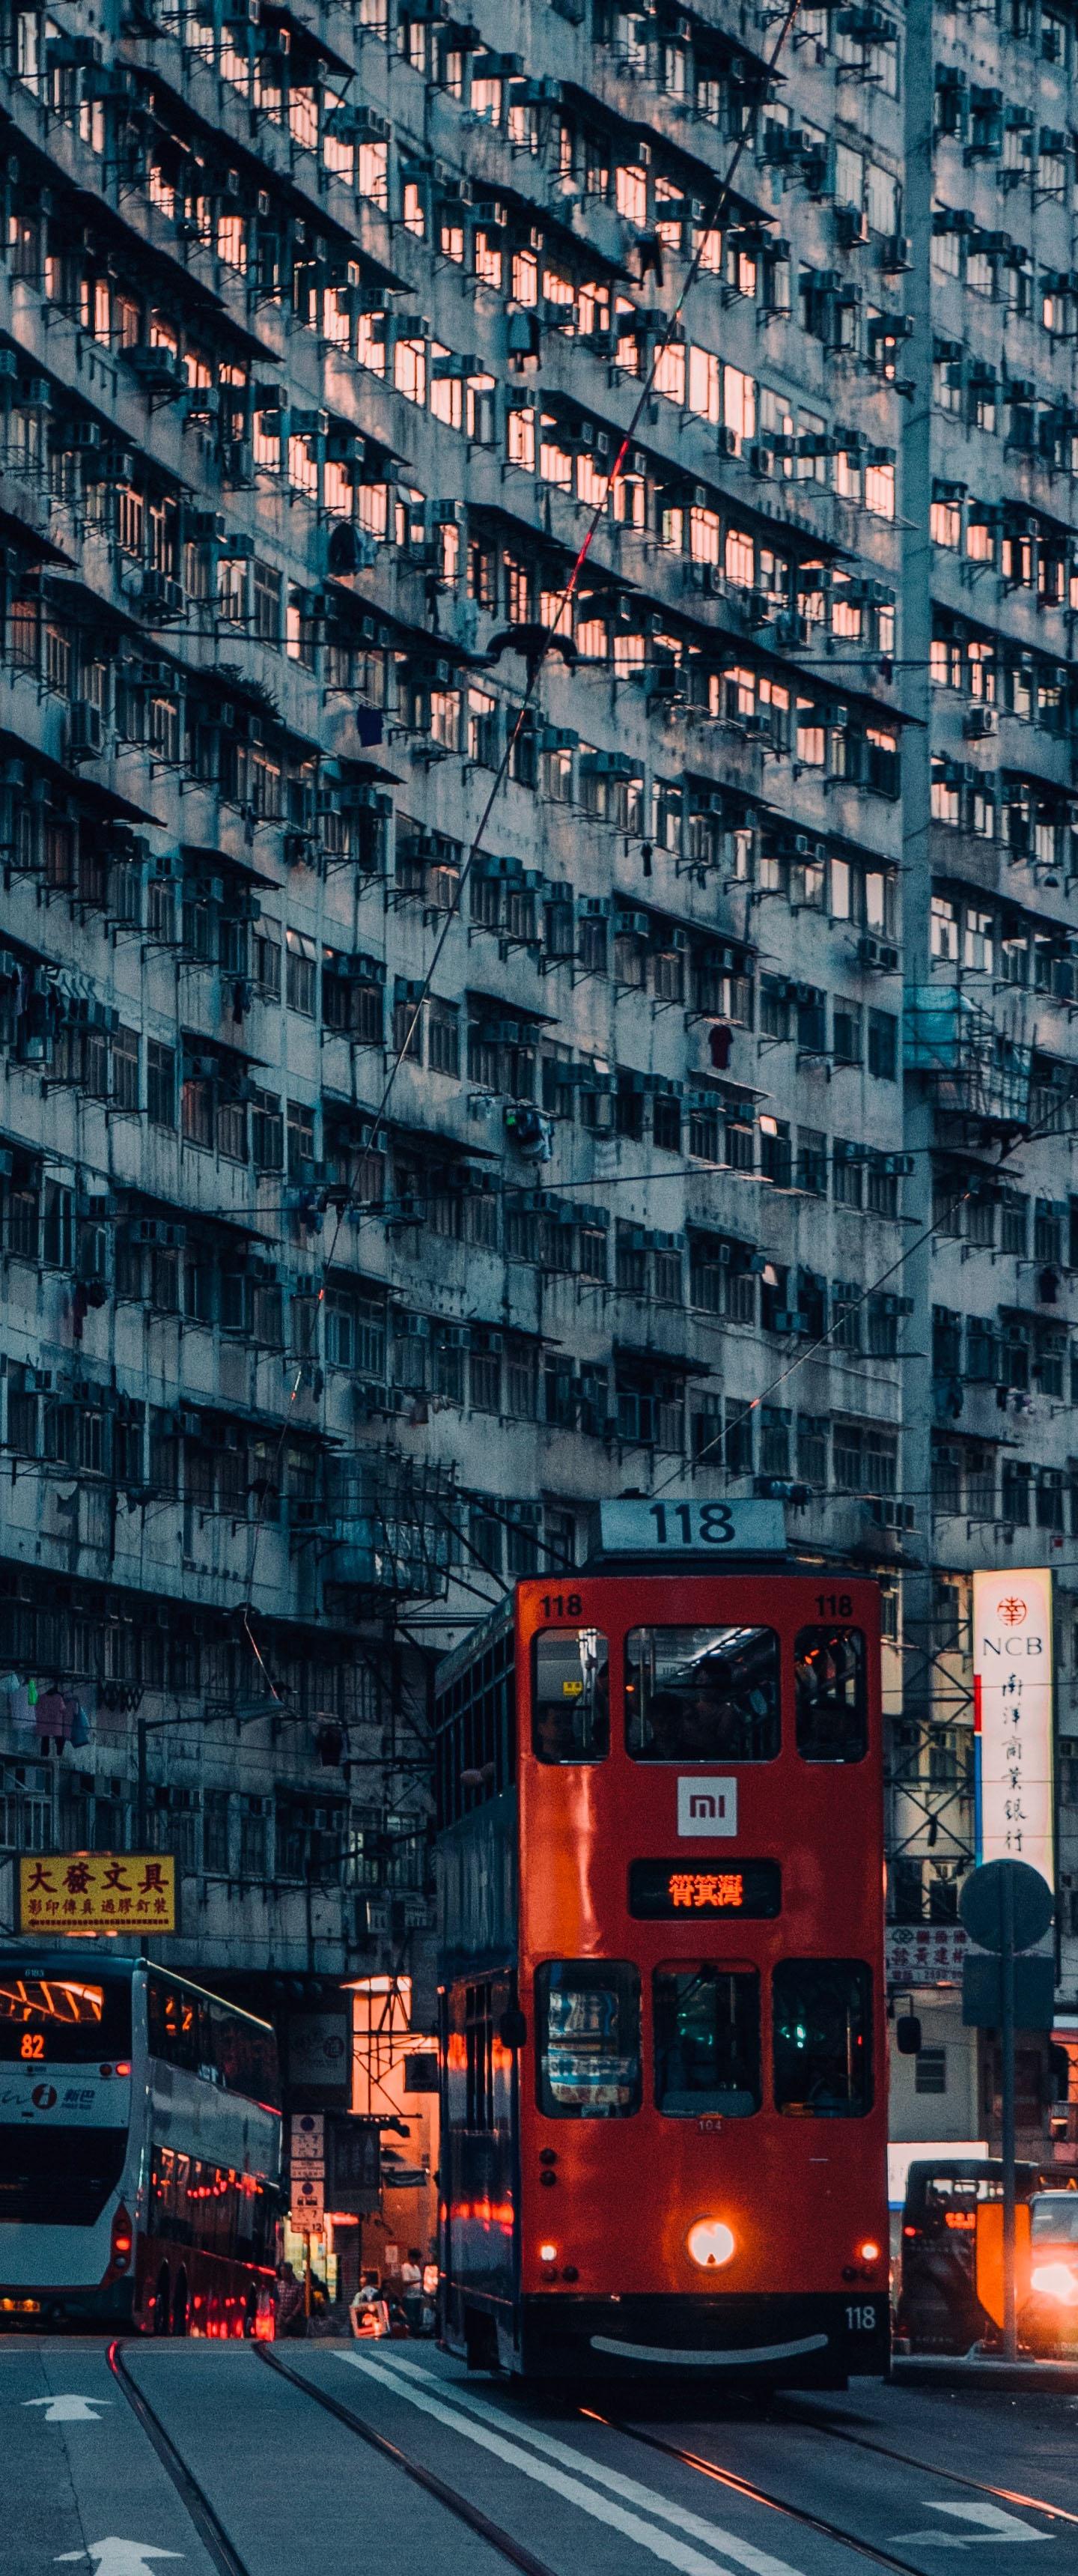 Hk City Life Vertical 21 9 Wallpaper Ultrawide Monitor 21